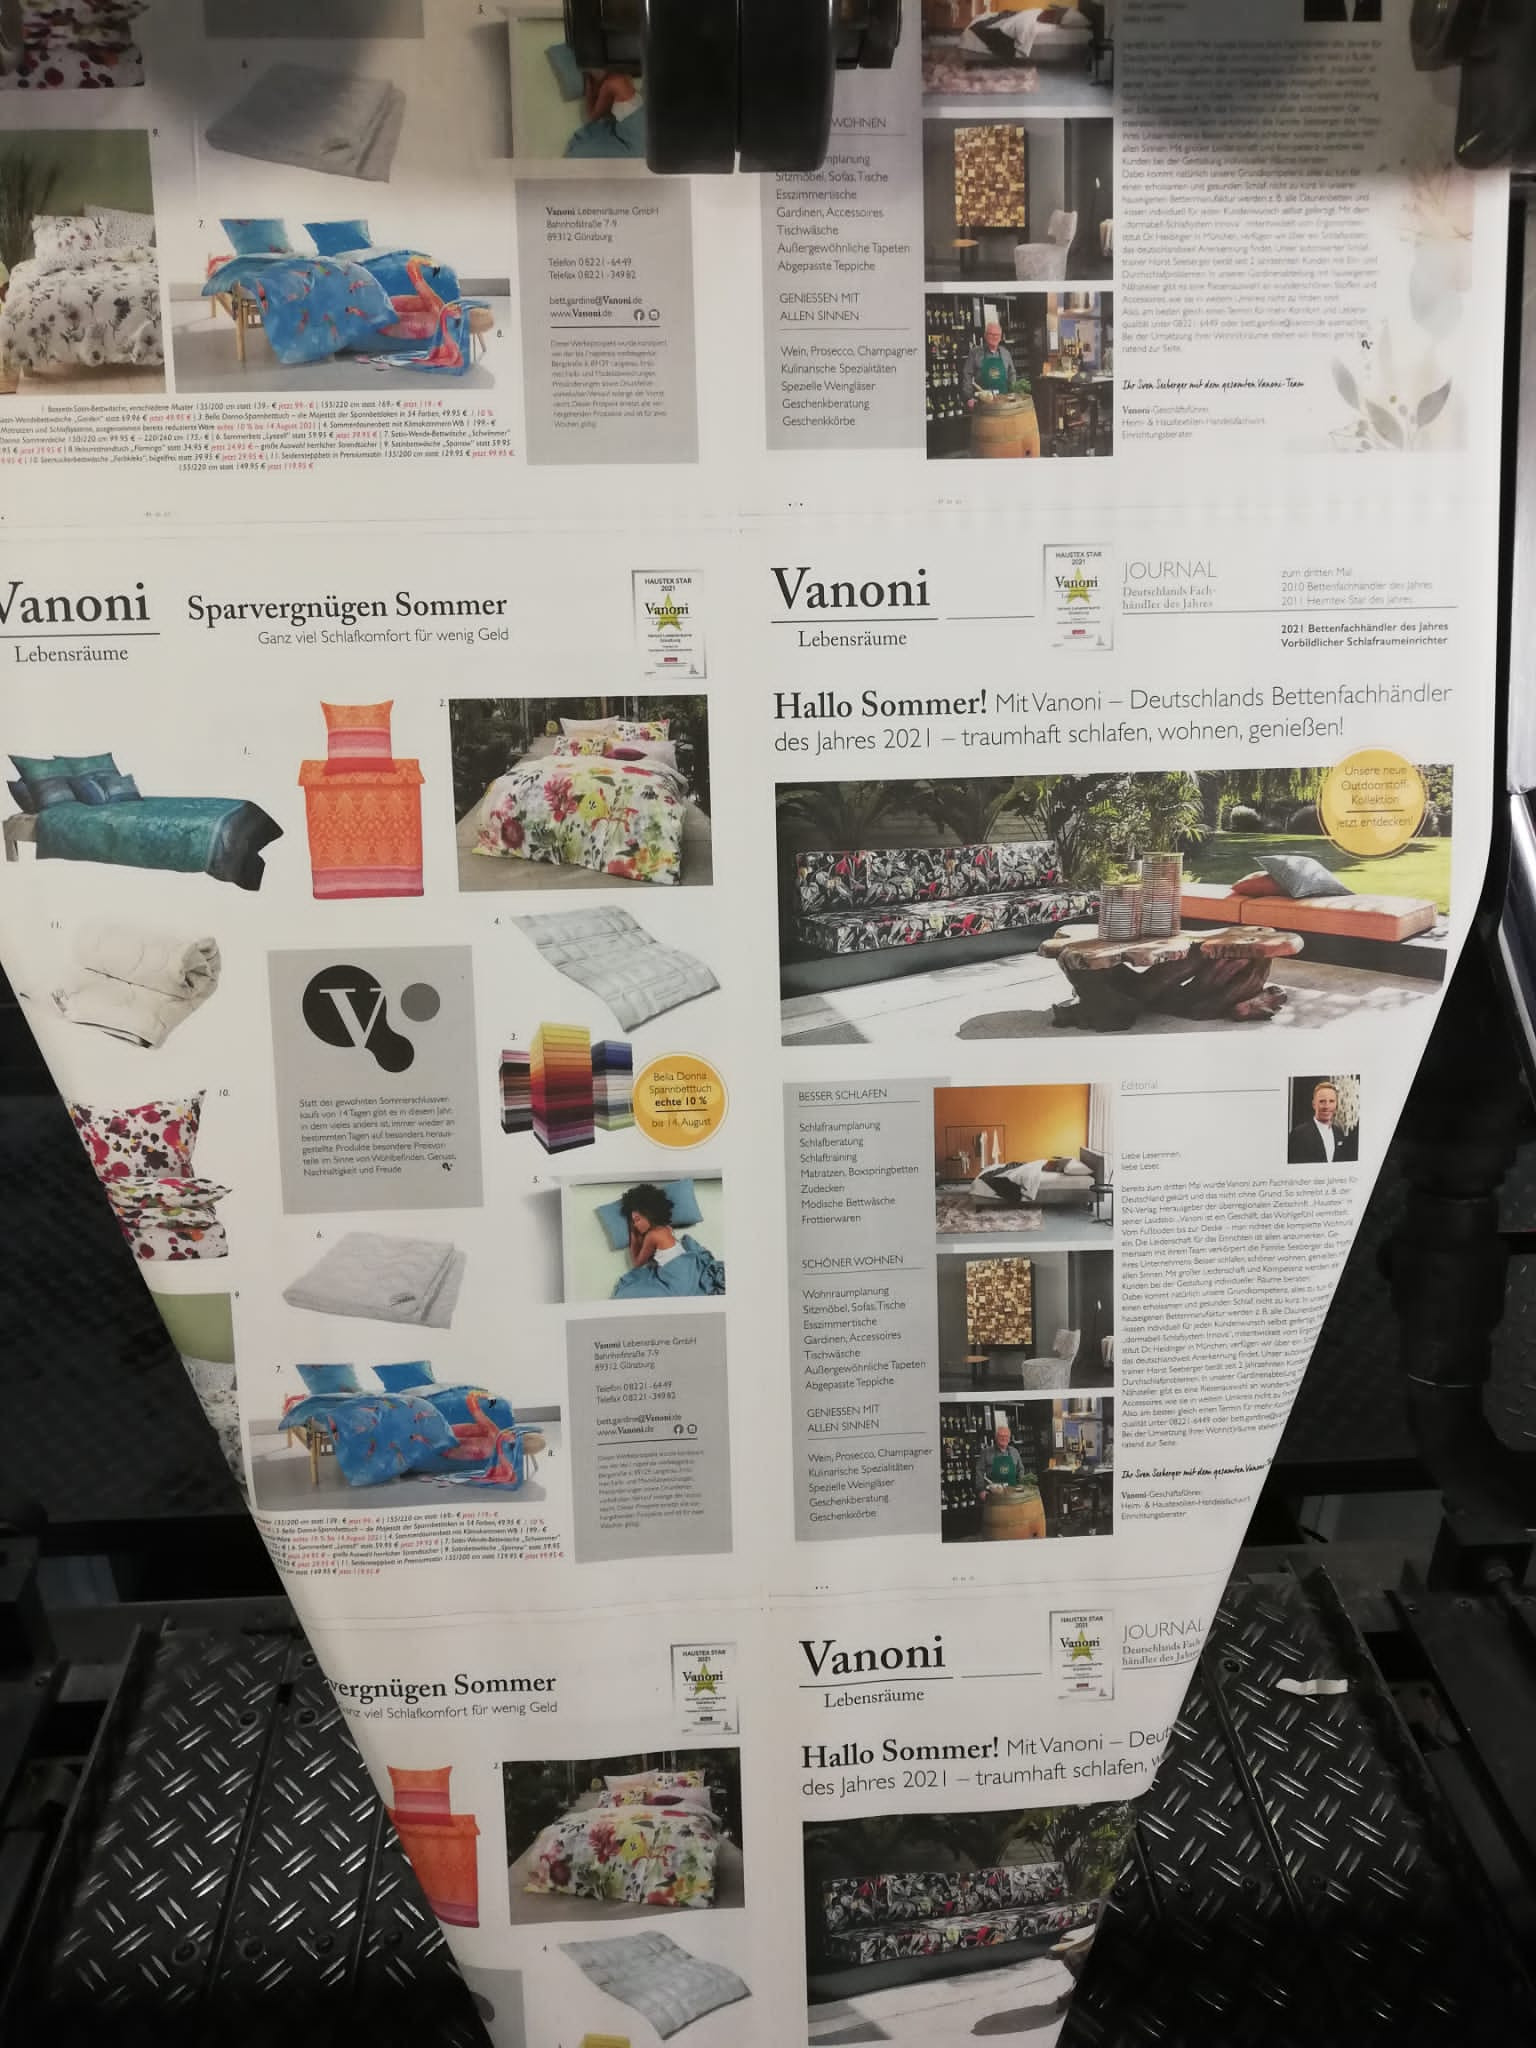 Vanoni - Lebensräume mit Stil!